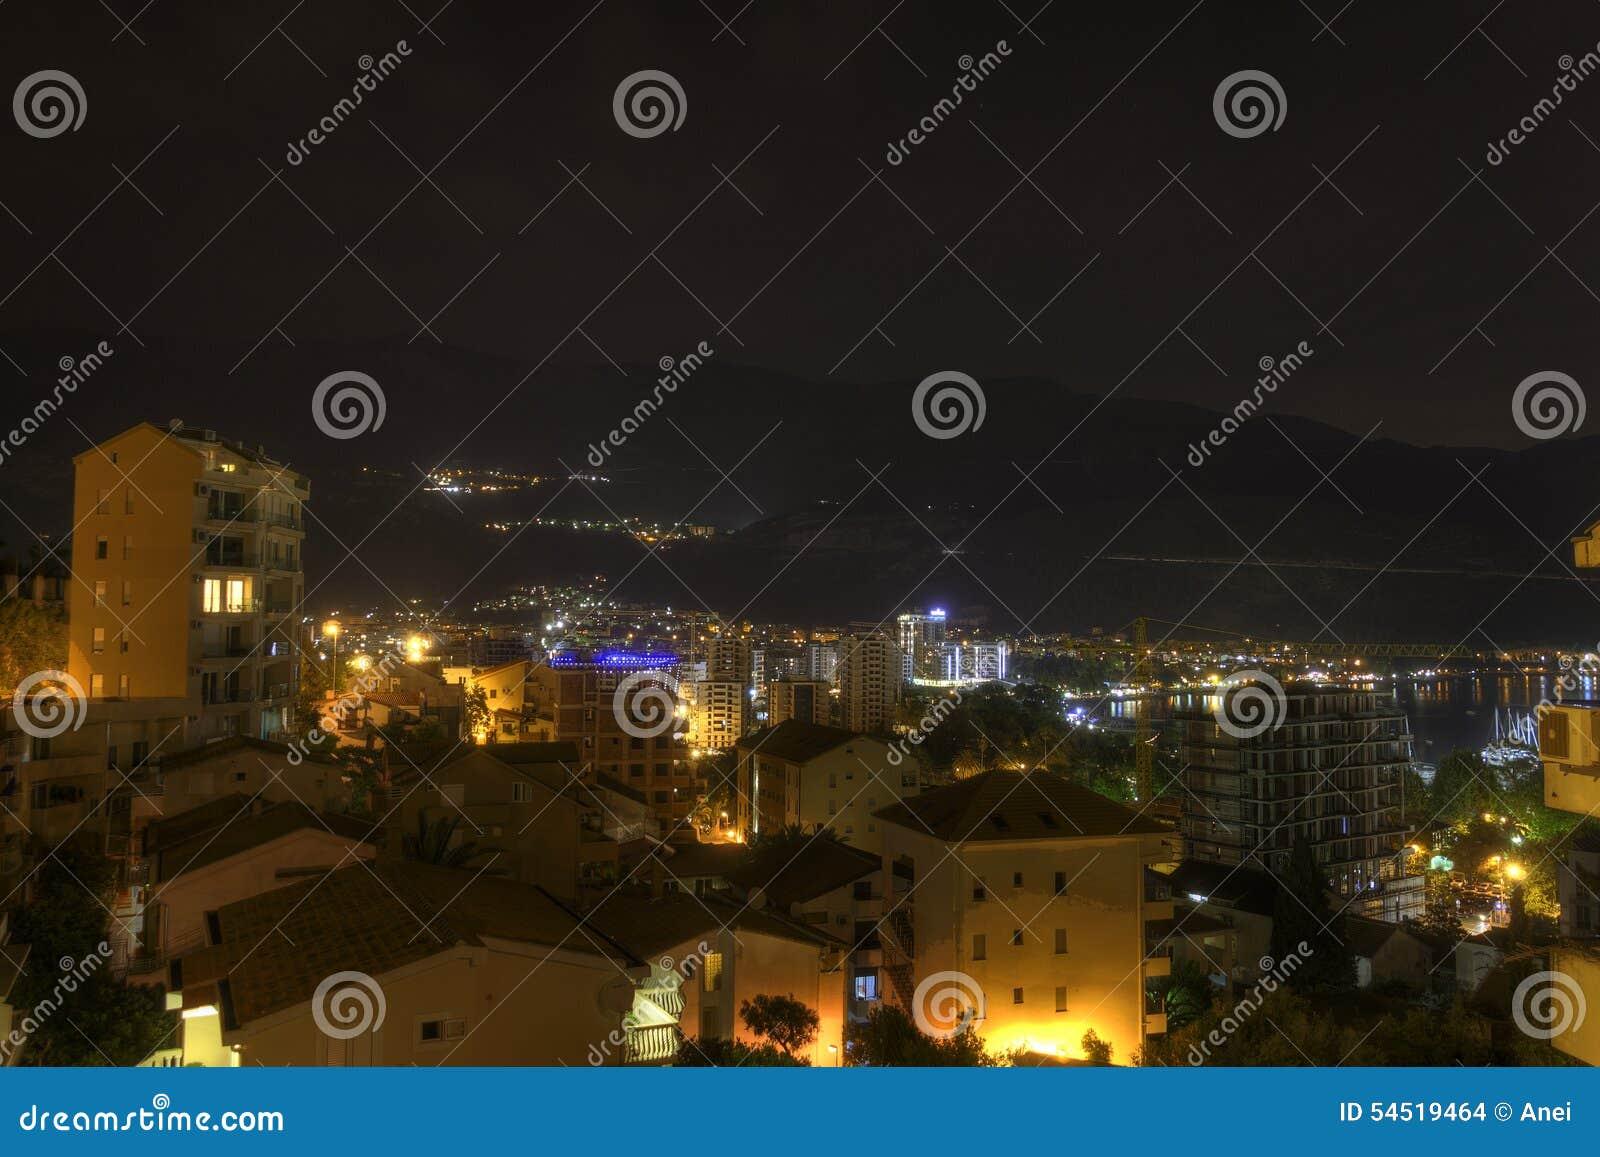 Bella foto di notte di HDR di una destinazione popolare di vacanza, la città di Budua